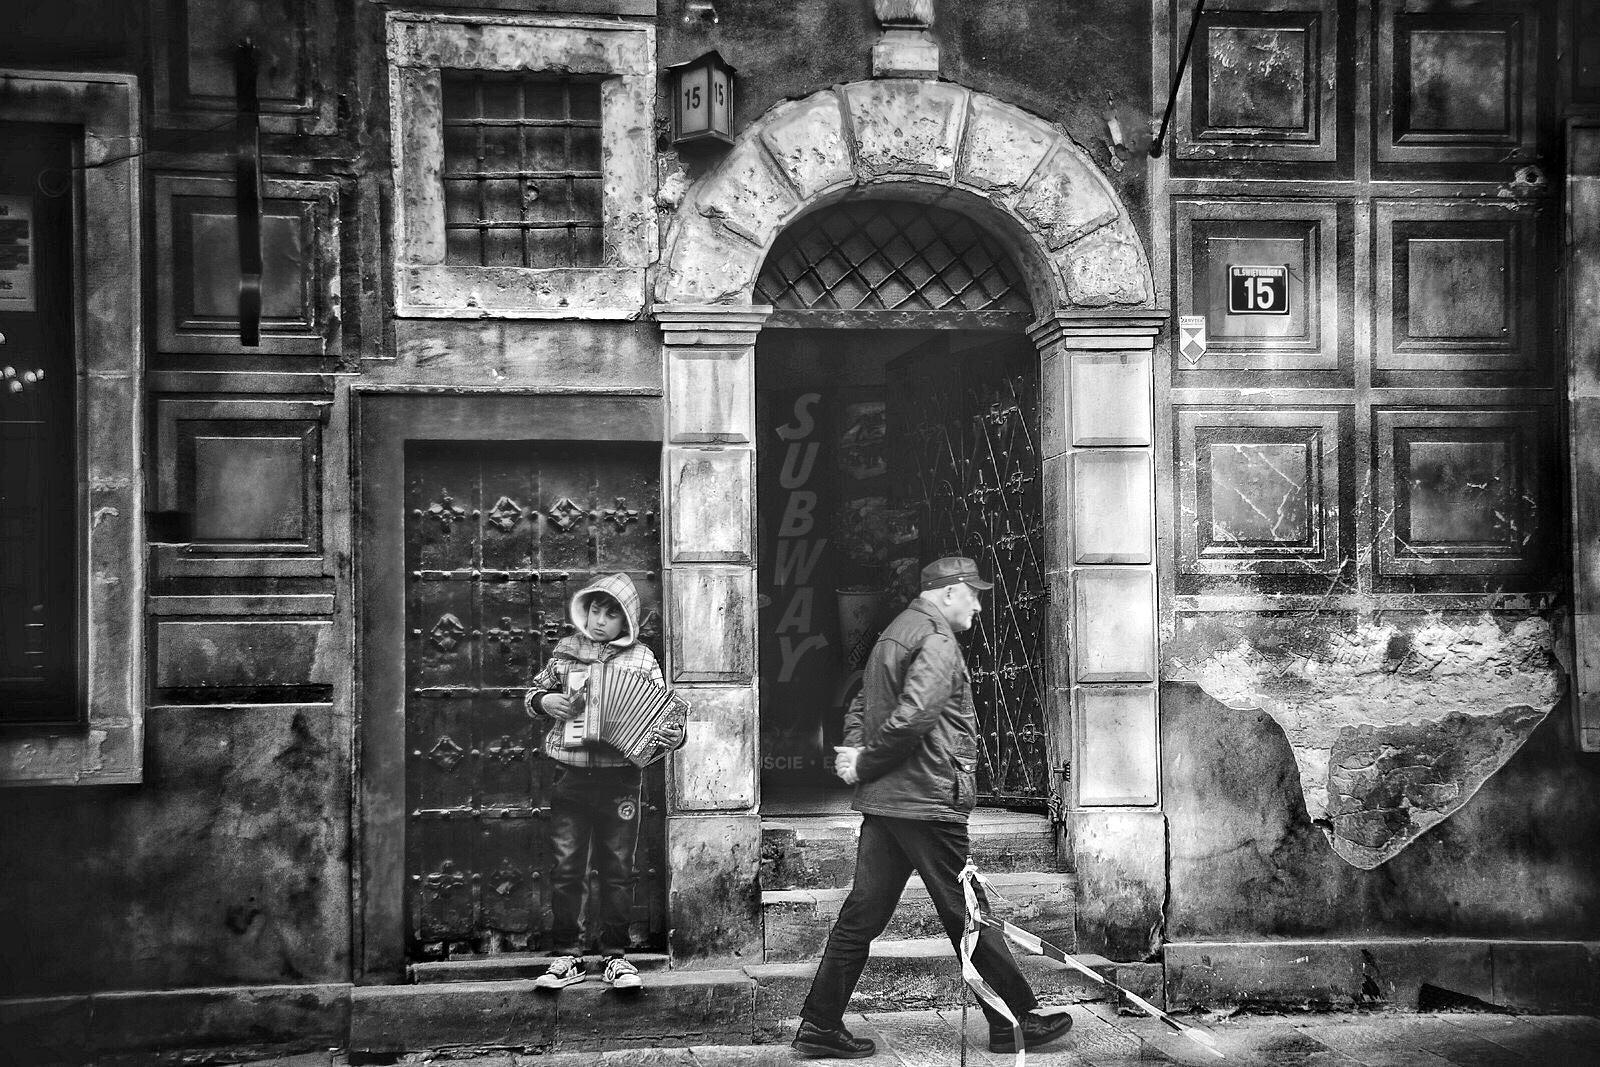 Warsaw Streetlife and Subway